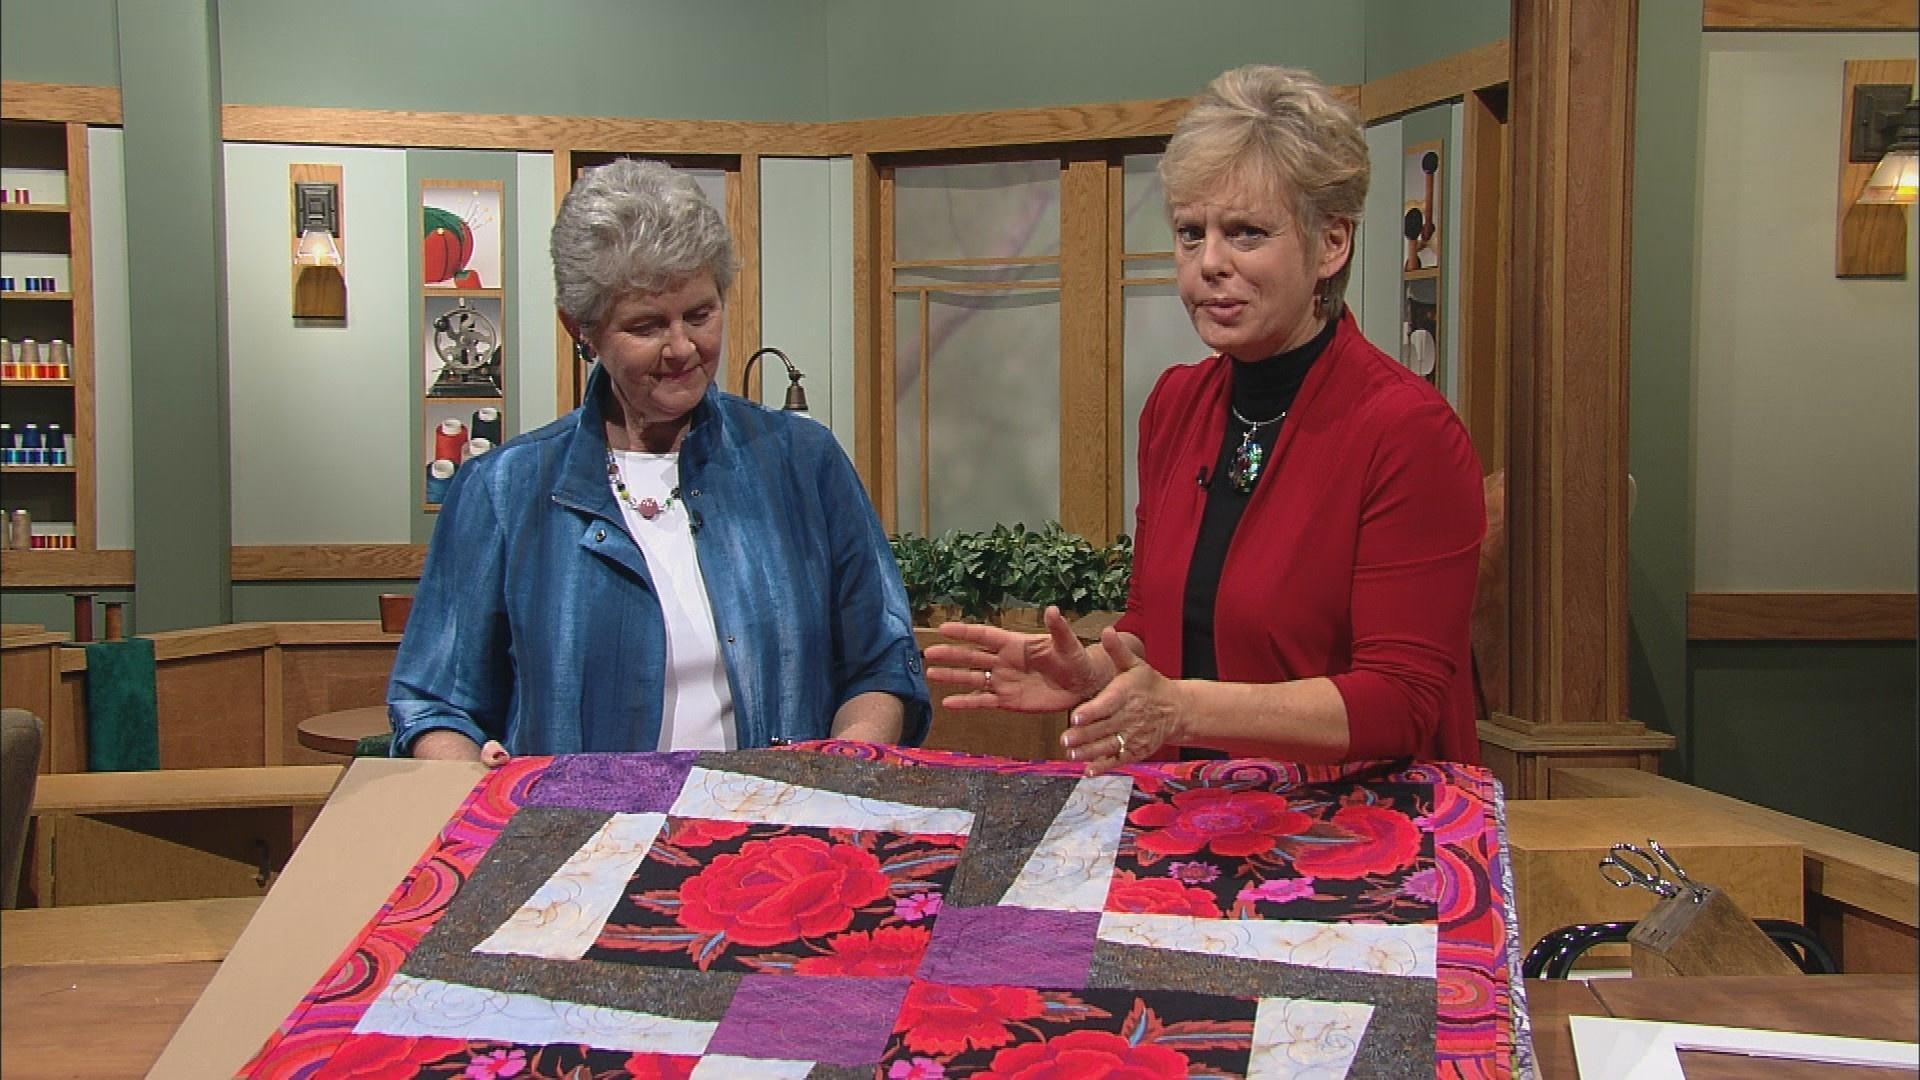 Video: Sew Big Quilt Blocks, Part 2   Watch Sewing With Nancy ... : sew big quilt blocks - Adamdwight.com